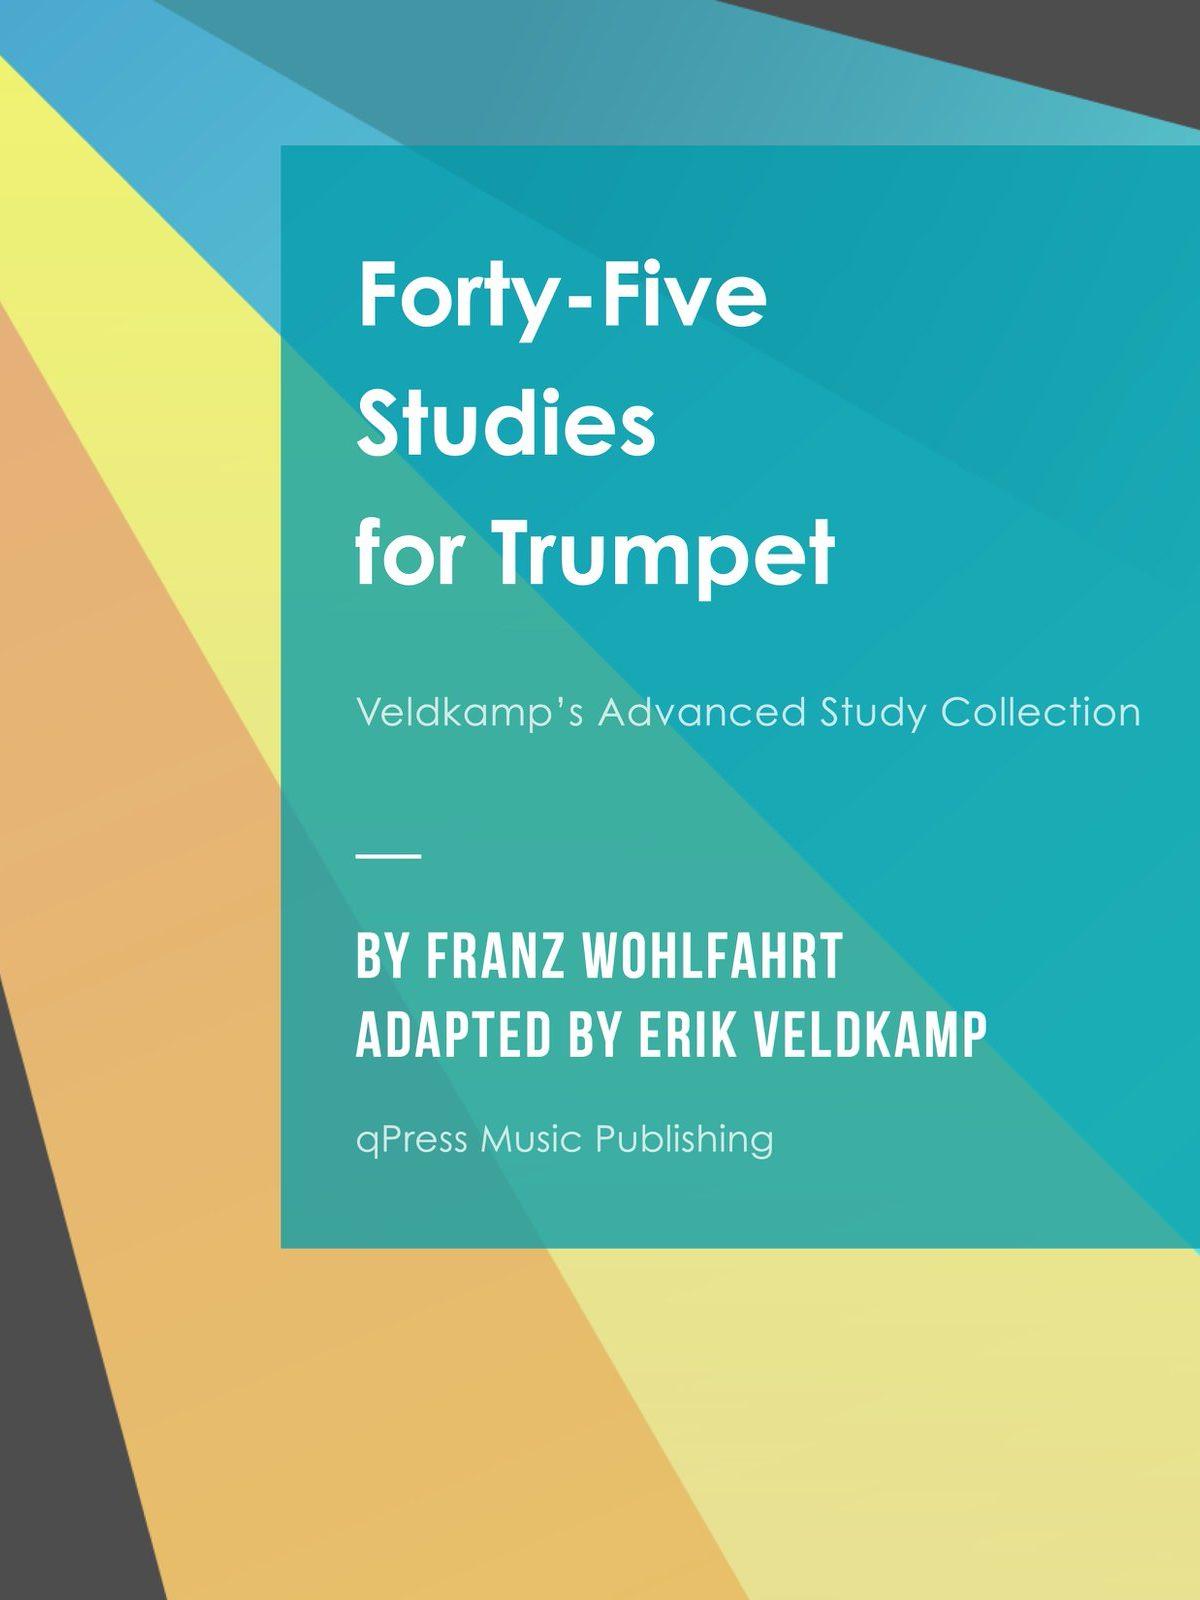 Veldkamp-Wohlfahrt, 45 Studies for Trumpet Op.45-p01